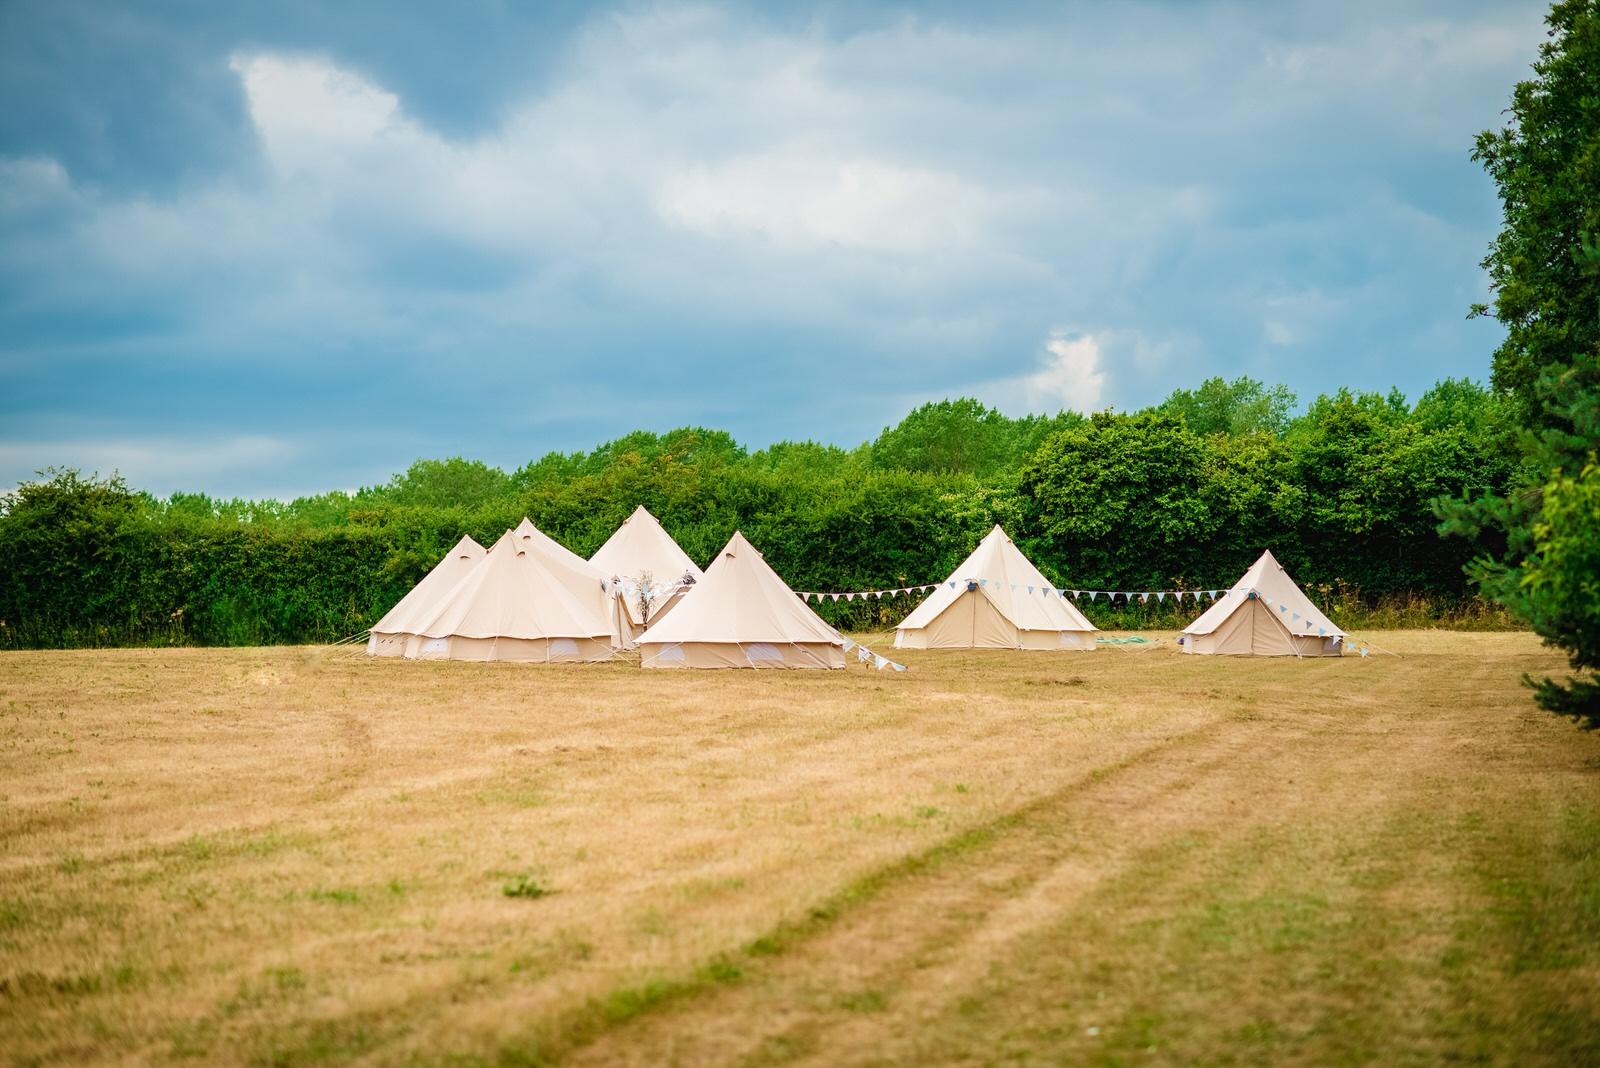 Cripps - GK Photography - 18.7.2018 - Ben & Jamiecripps+barn+gloucestershire+wedding+venue.jpg